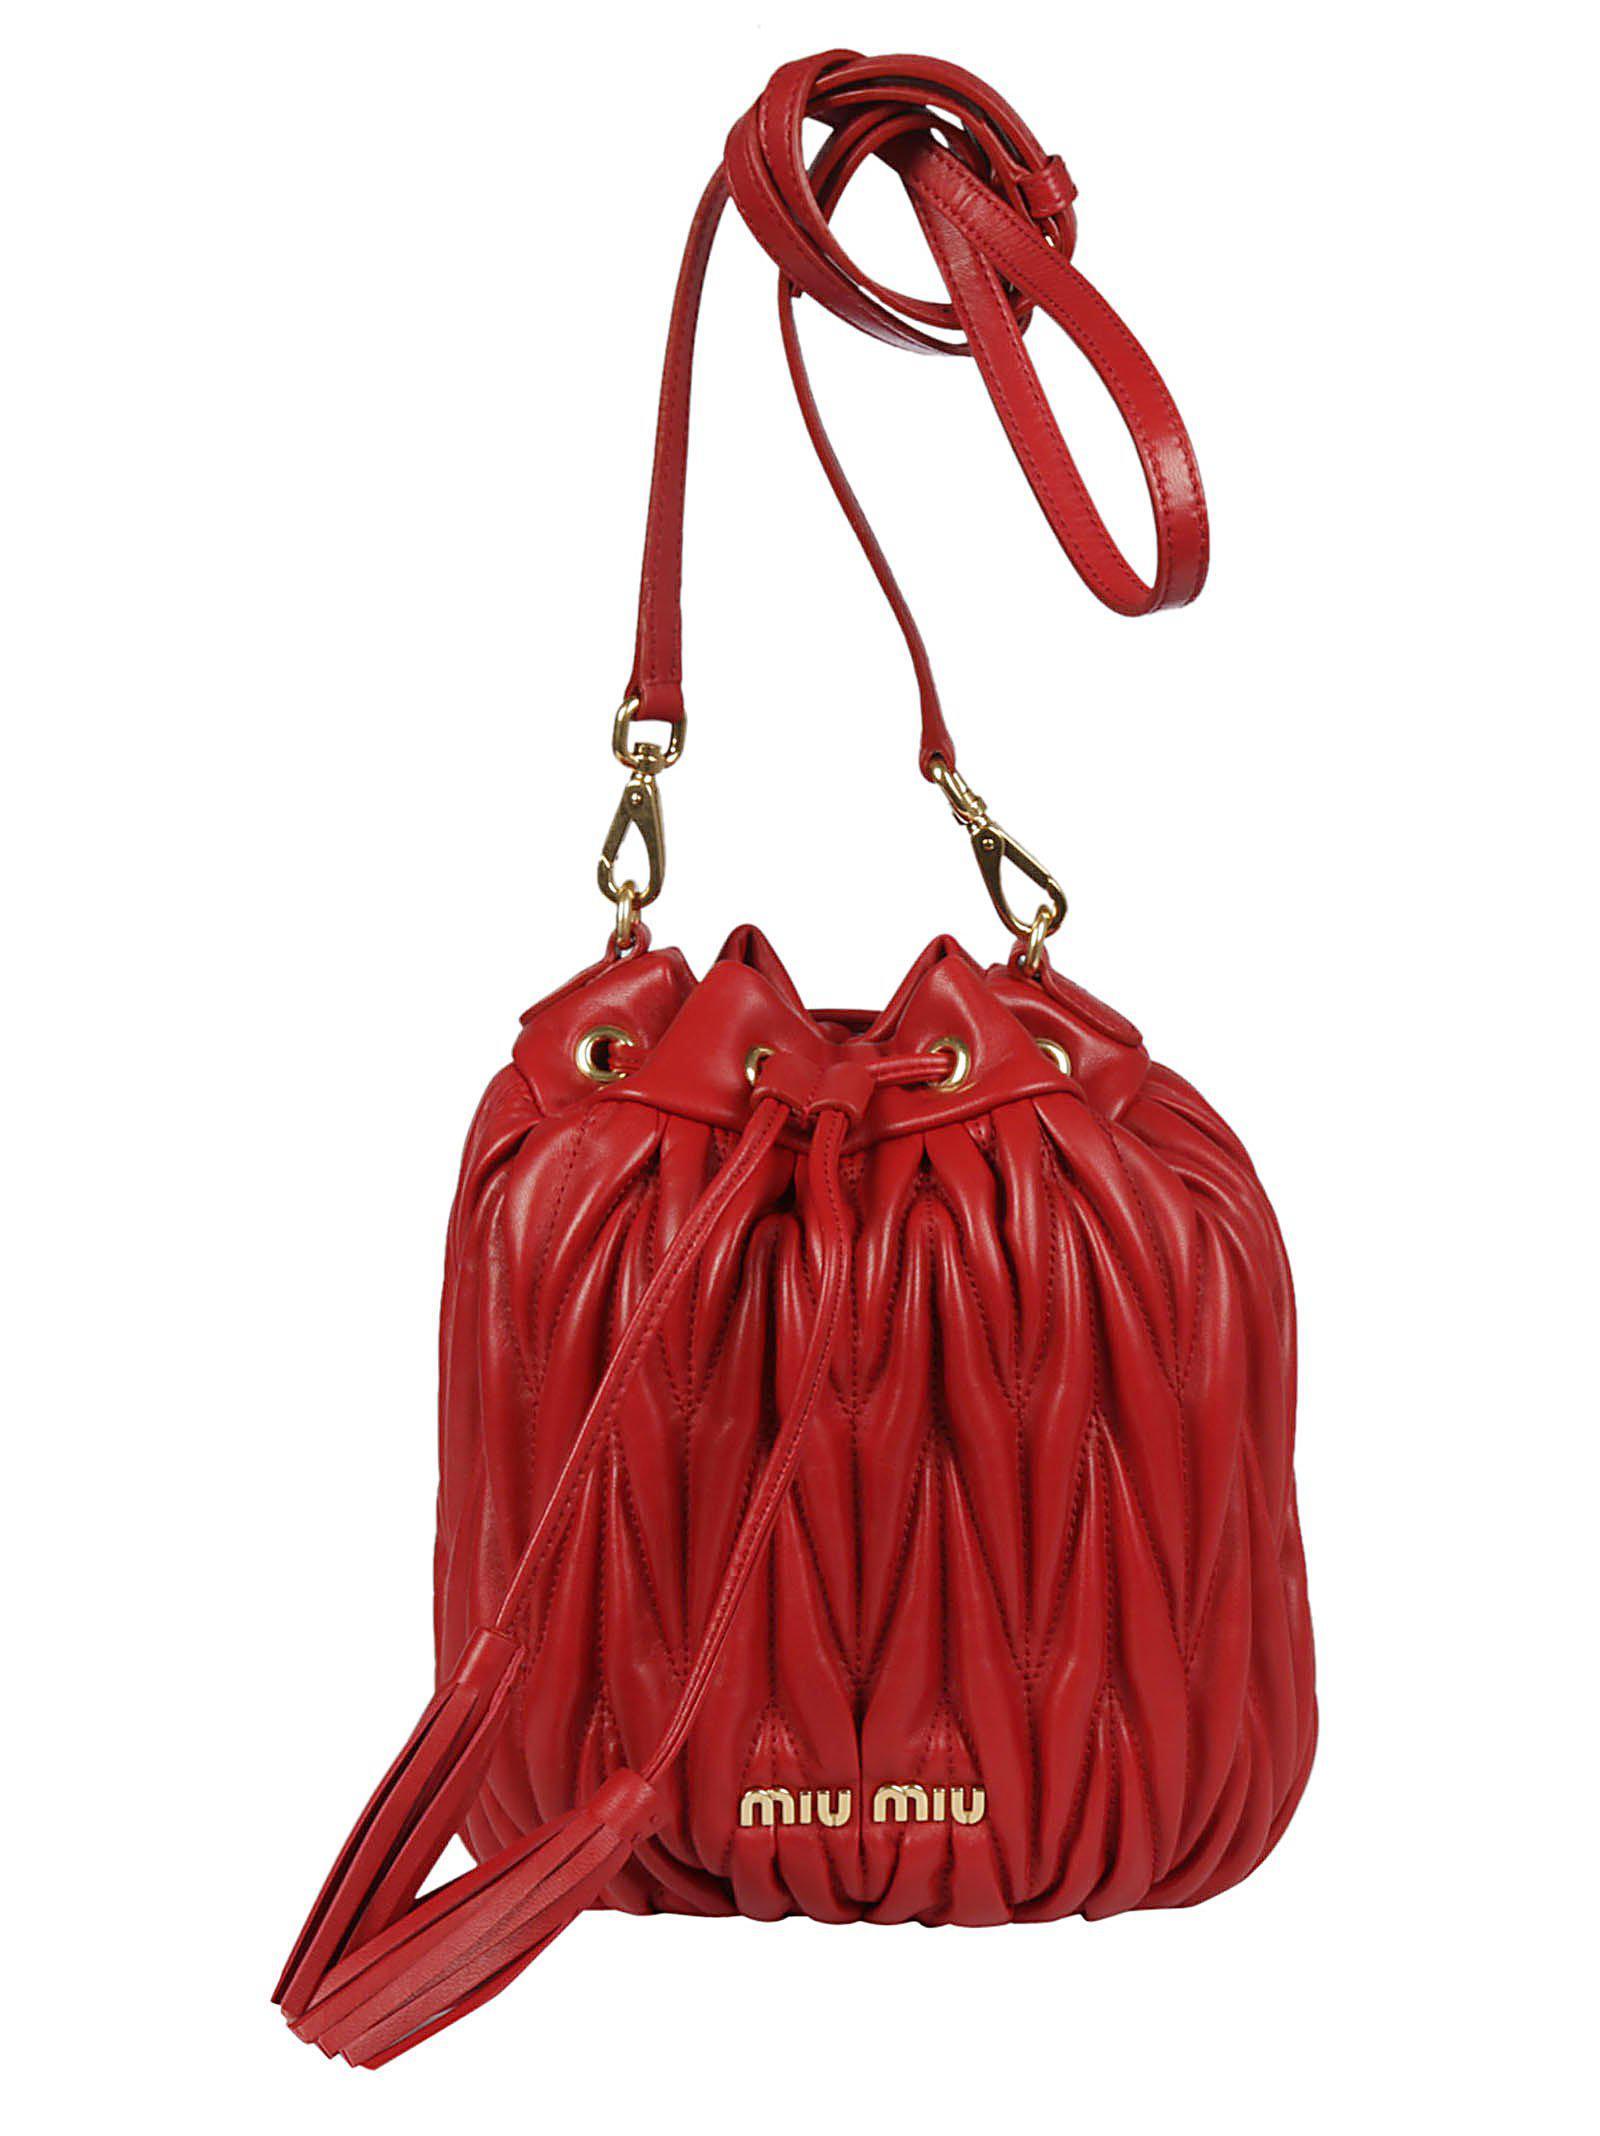 566a64b17b8a Lyst - Miu Miu Matelassé Bucket Bag in Red